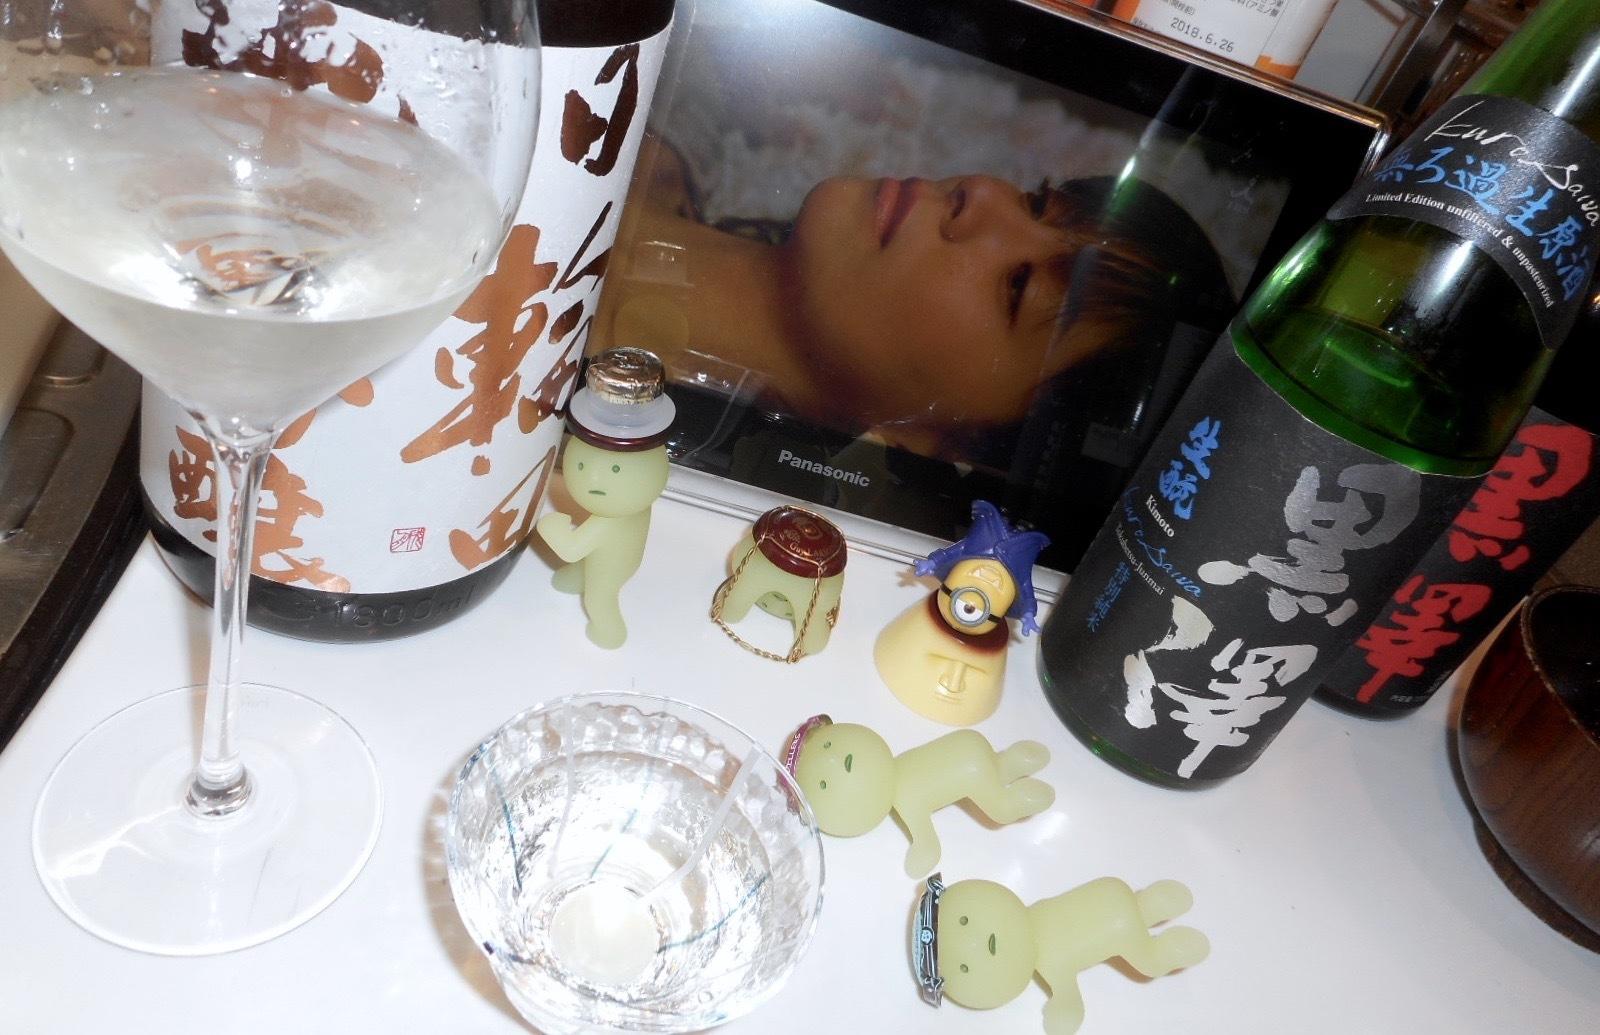 hiwata_mukaatsu26by3_4.jpg